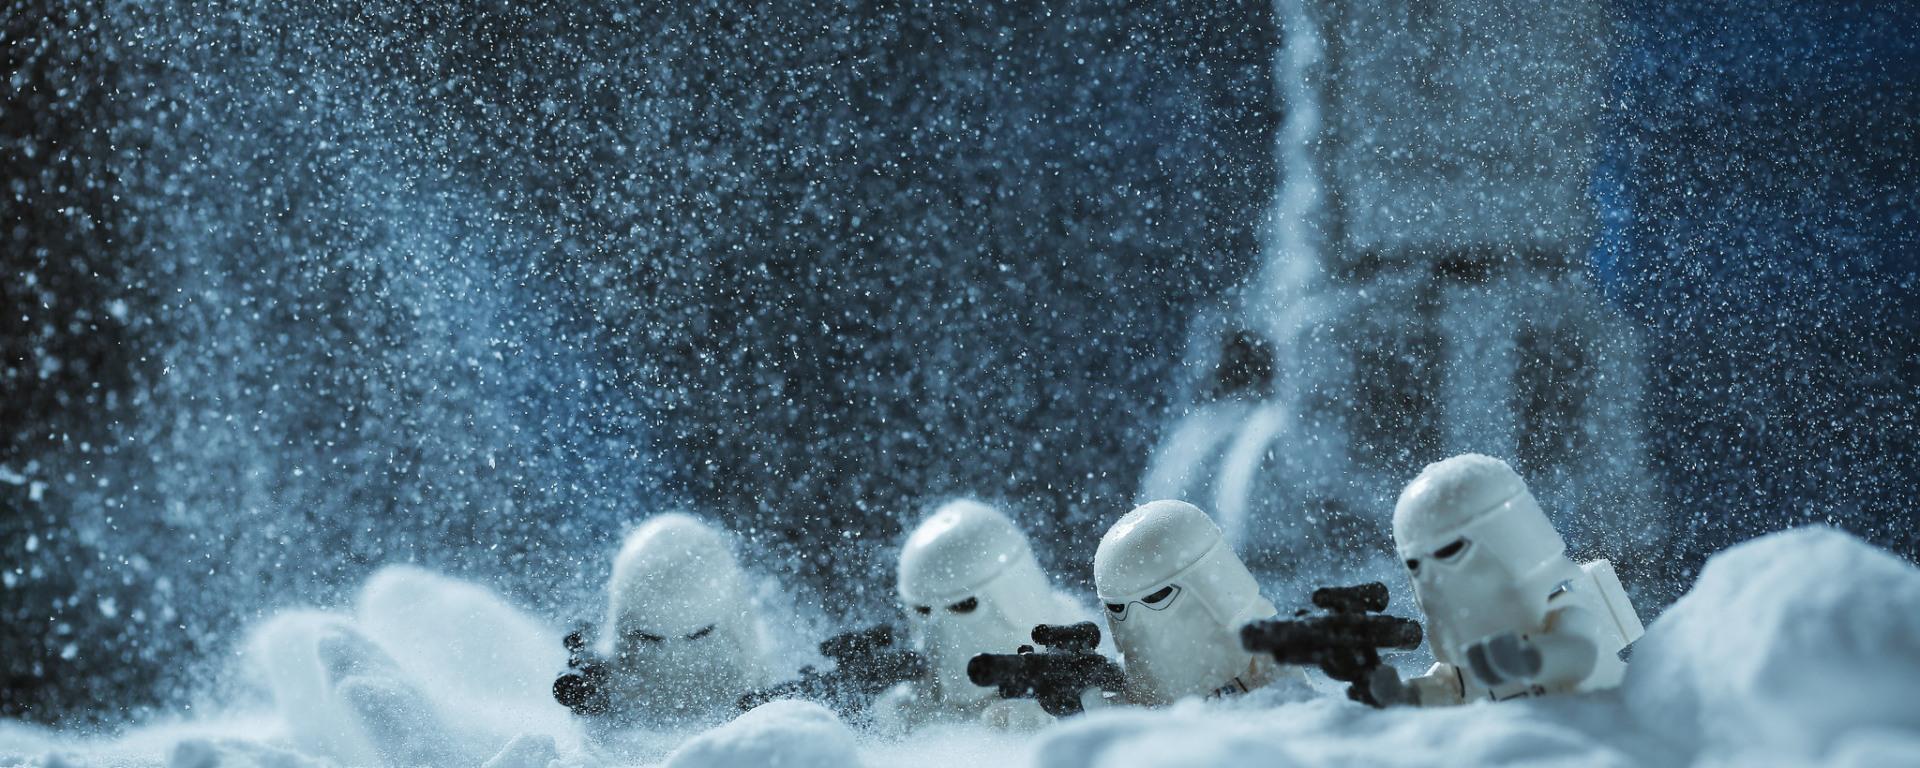 Lego Snow Troopers Surveillance